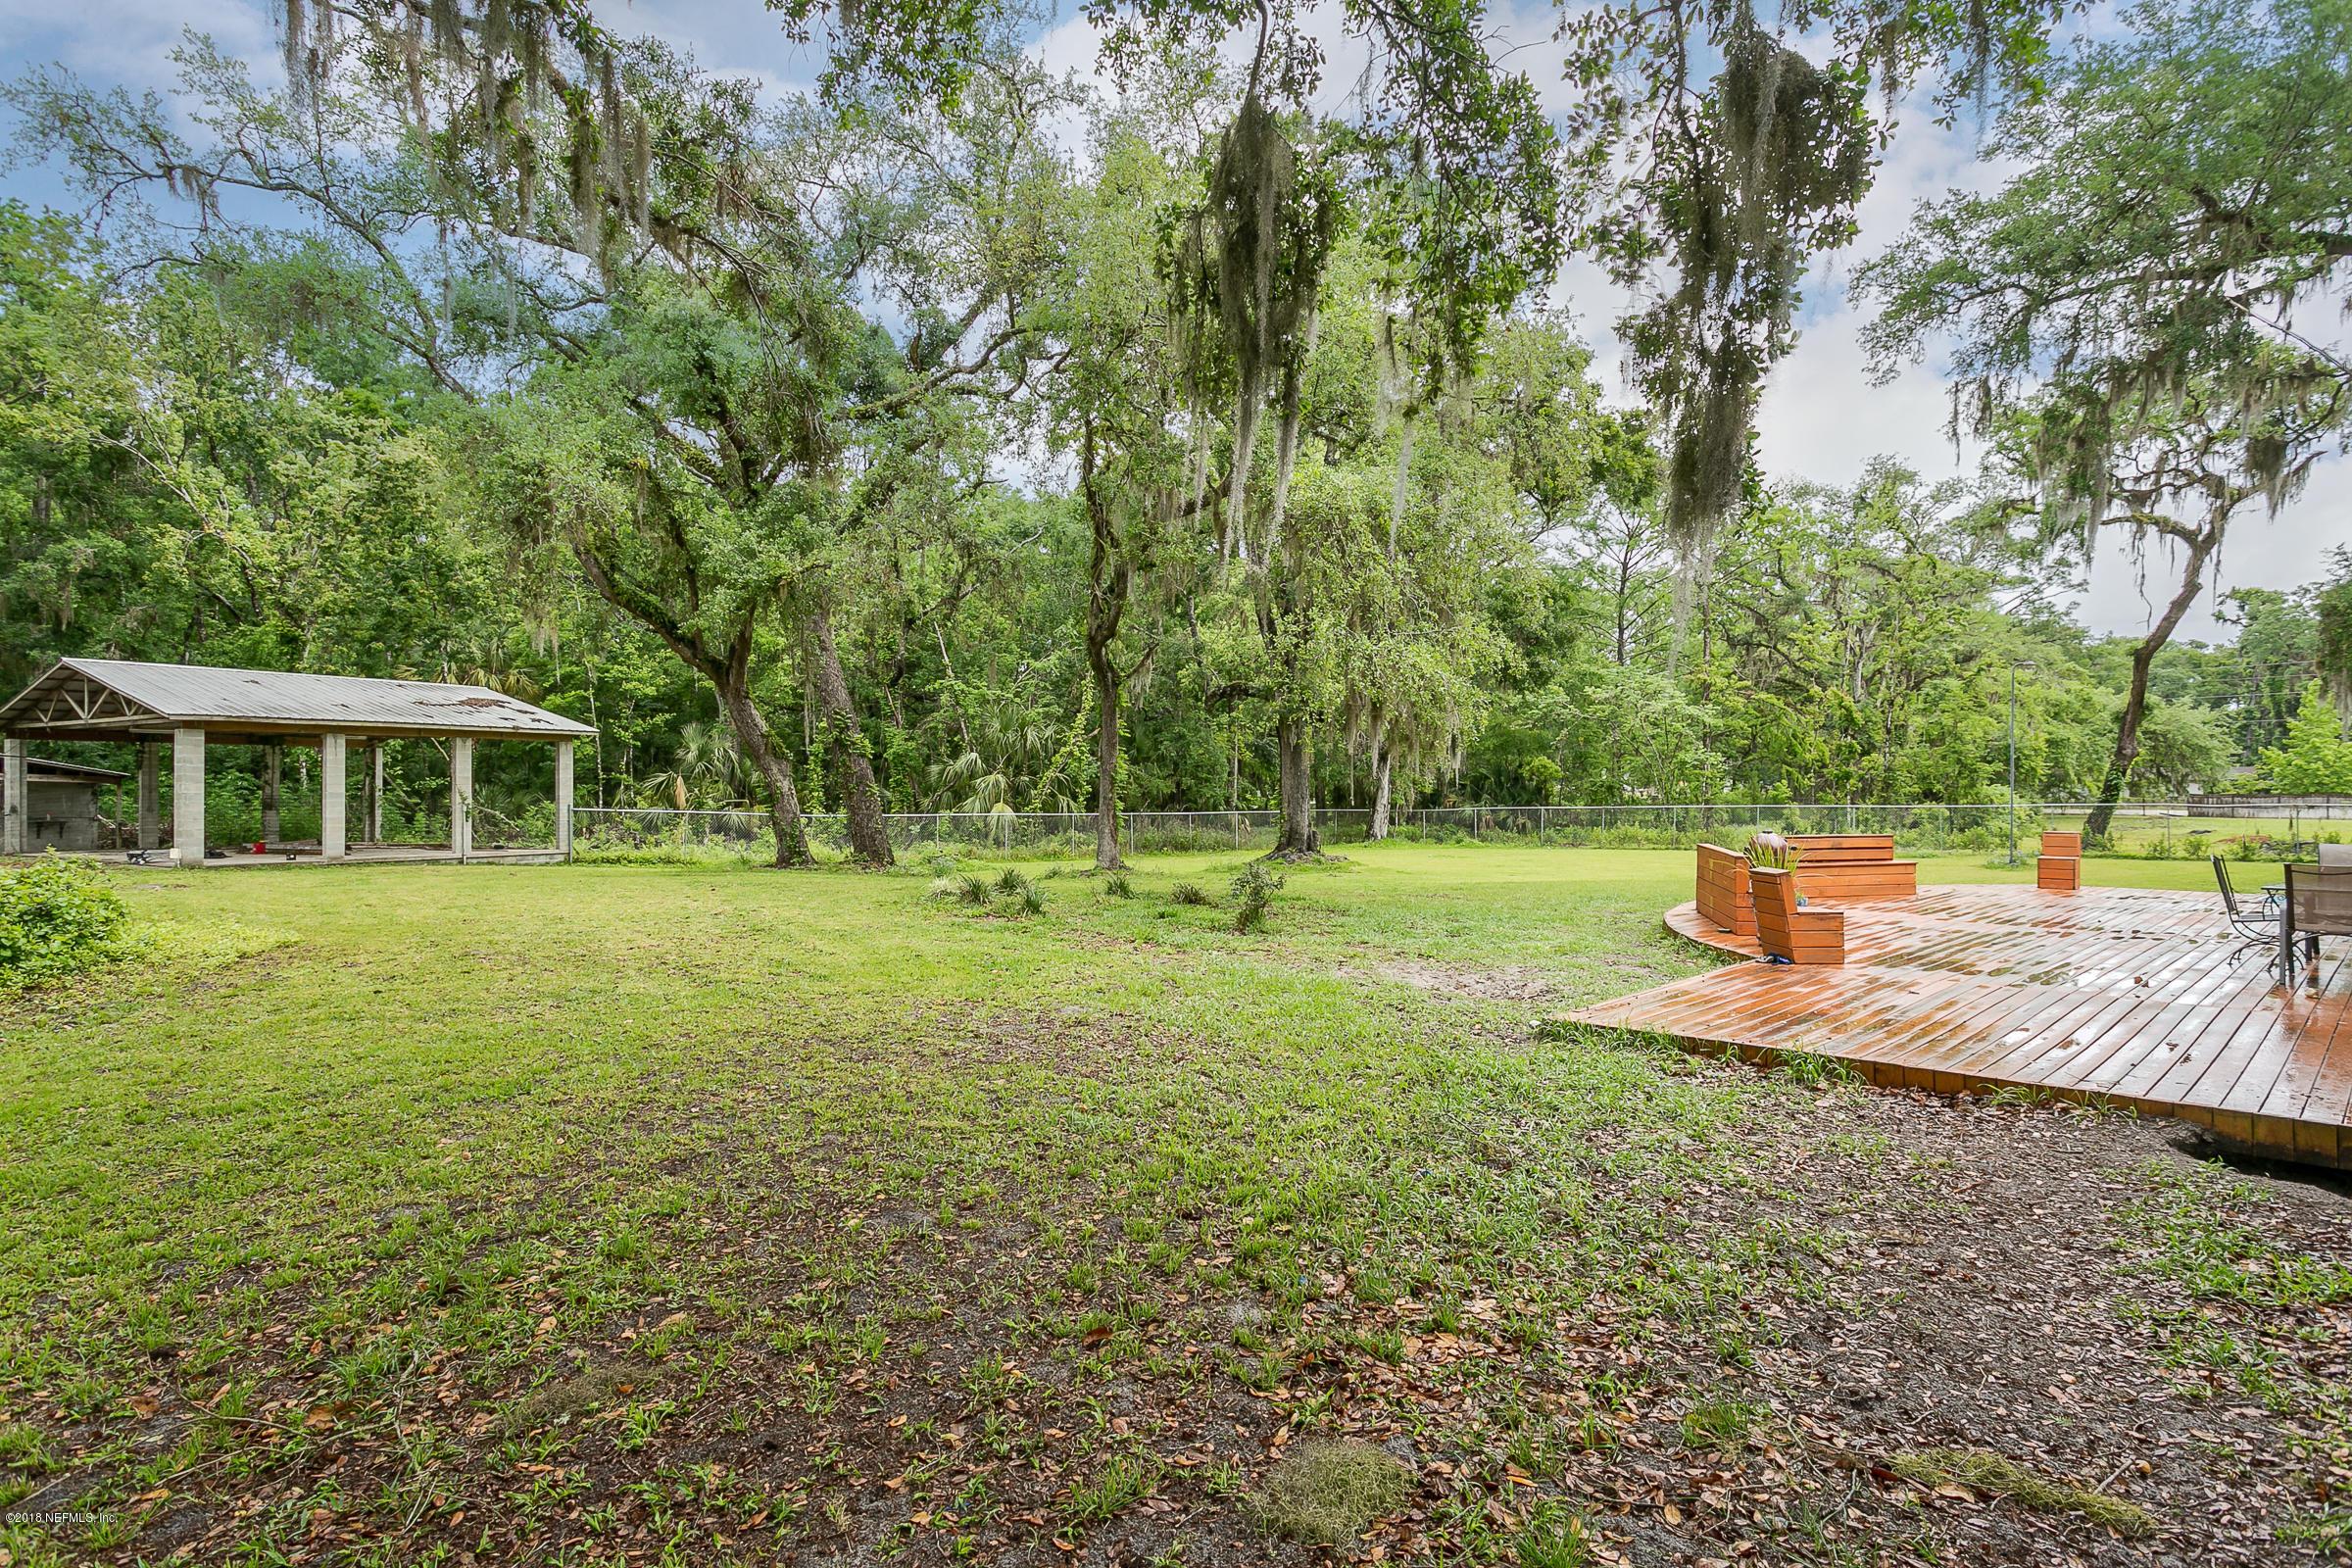 114 GRAFFT, ST AUGUSTINE, FLORIDA 32084, 3 Bedrooms Bedrooms, ,2 BathroomsBathrooms,Residential - single family,For sale,GRAFFT,932784